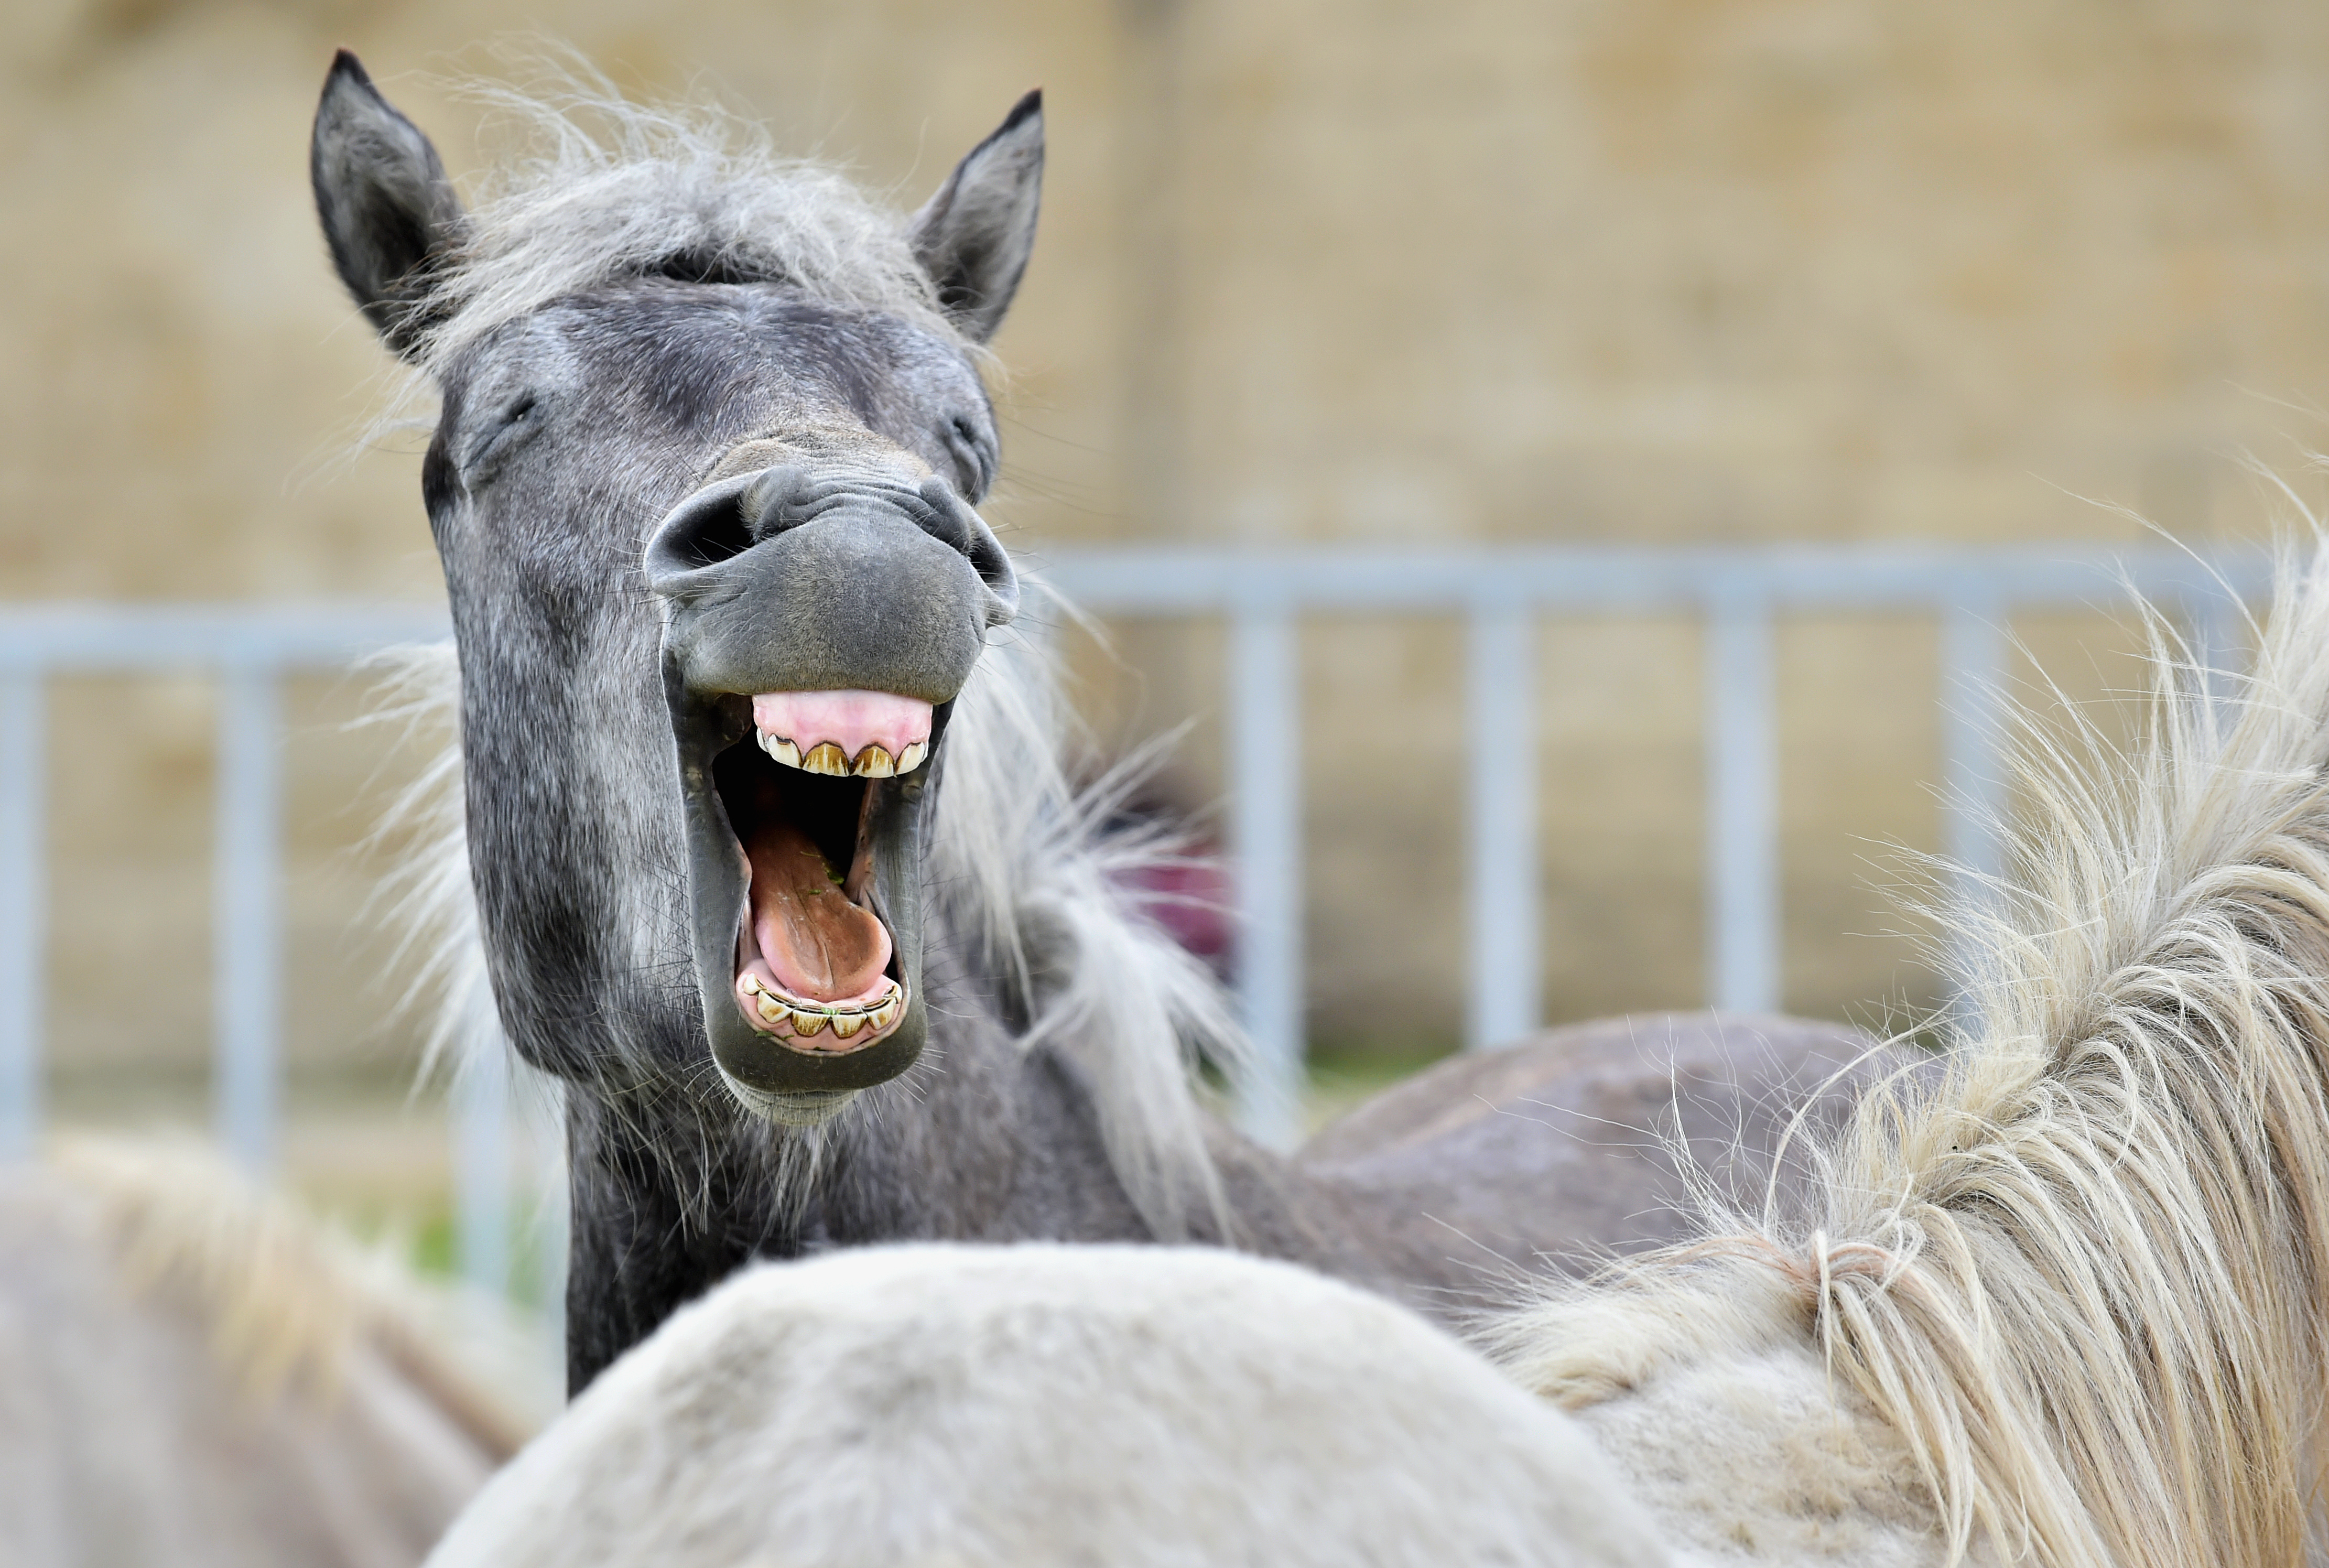 Gähnen_Symptom_Magengeschwuer_Pferd